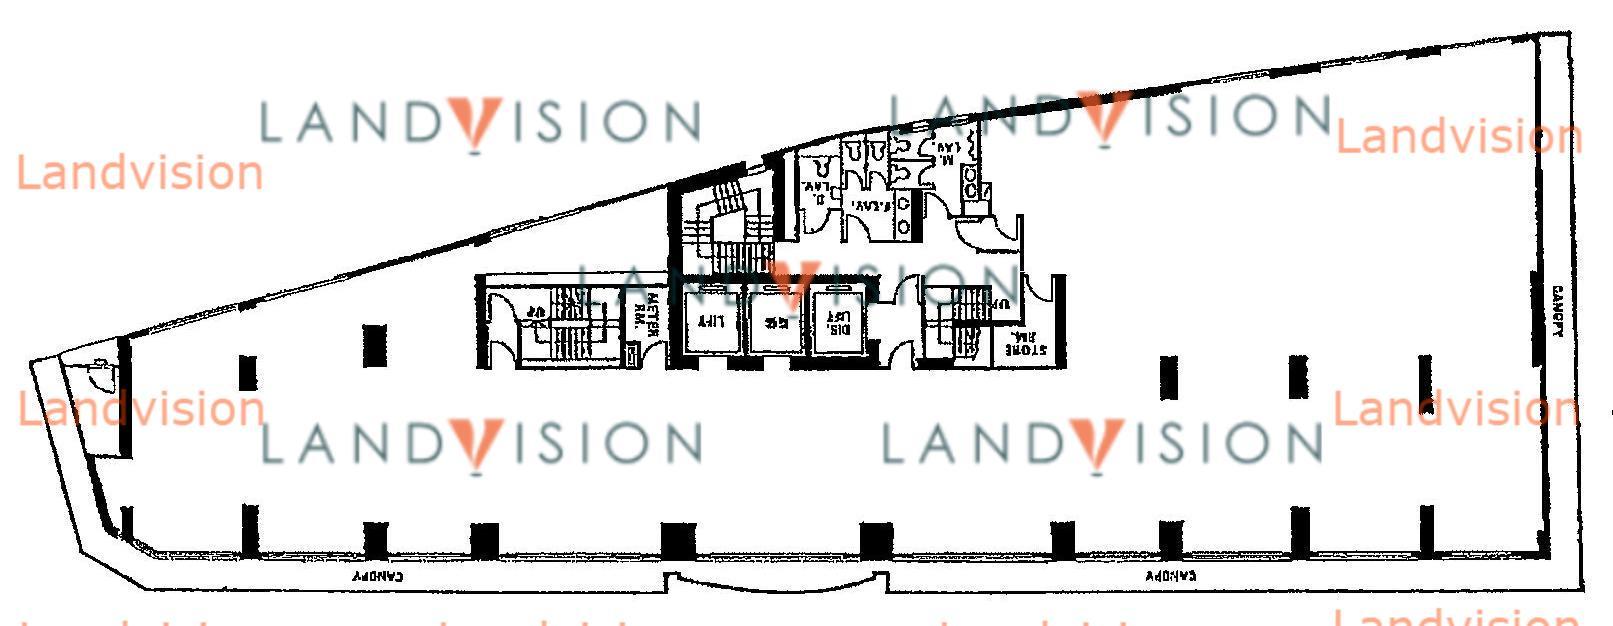 https://www.landvision.com.hk/wp-content/uploads/website/resize/floorplans/003075.JPG